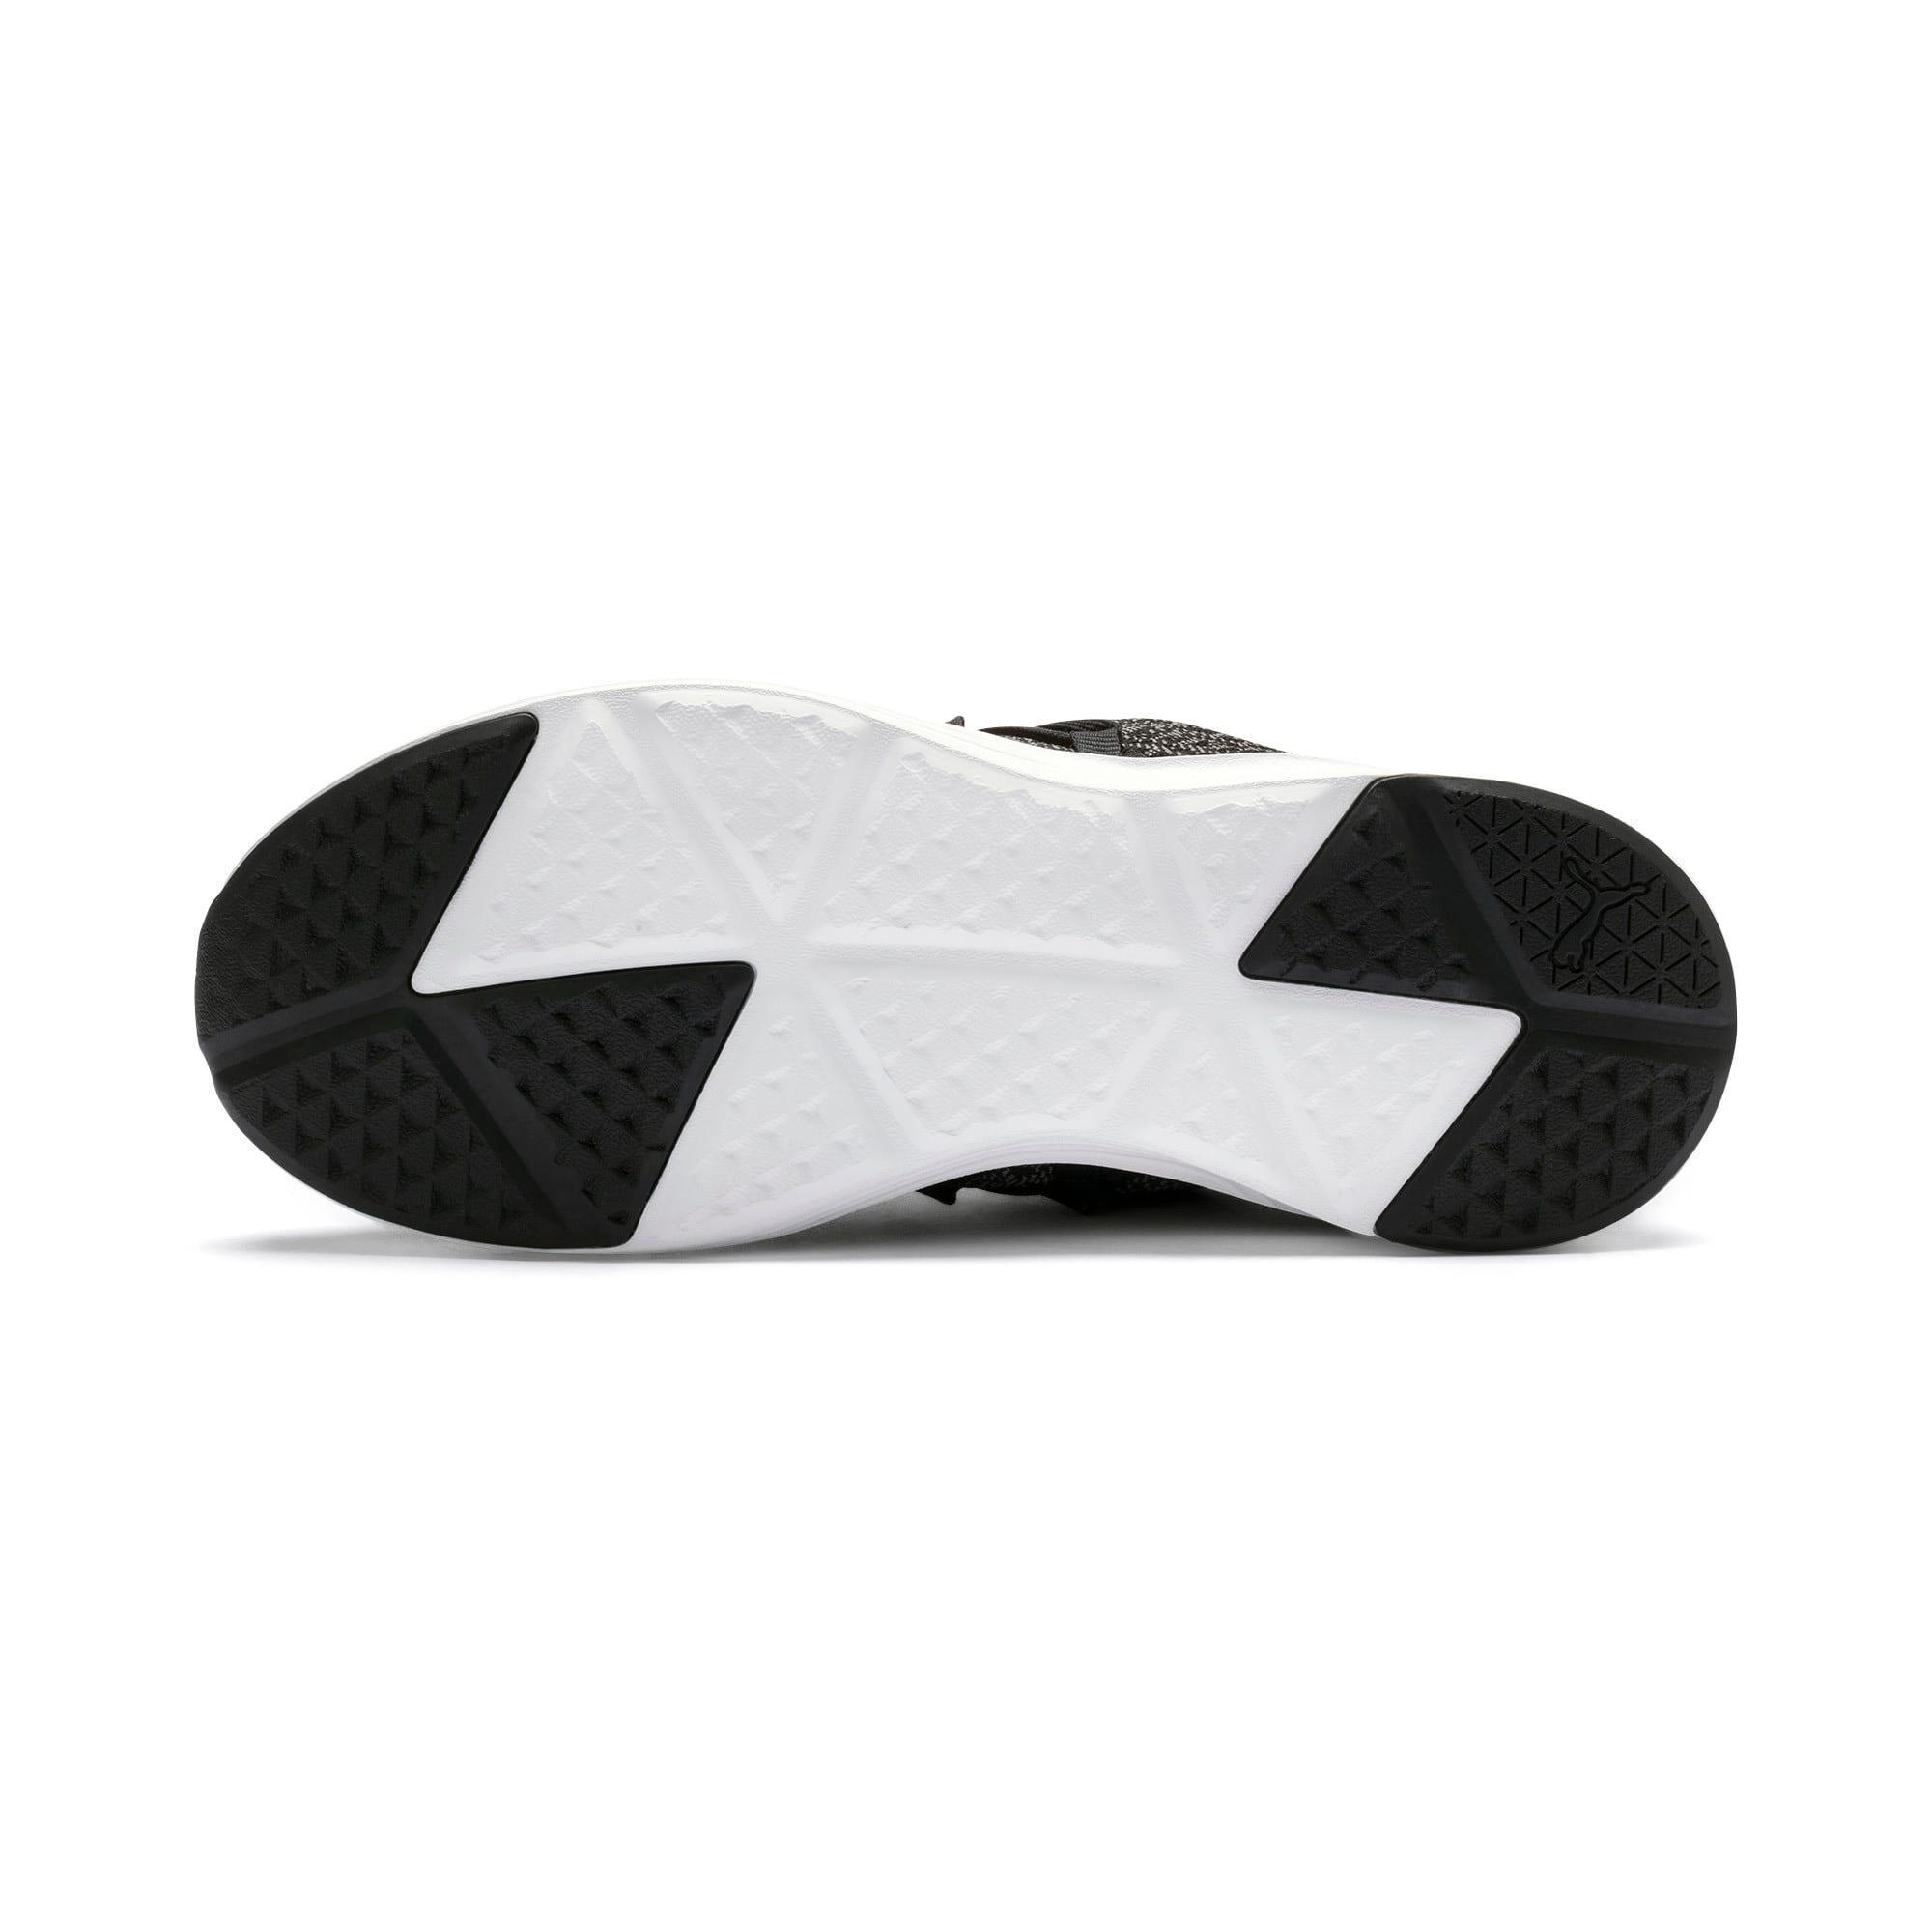 Thumbnail 3 of Prowl Alt Knit Women's Training Shoes, Puma Black-Puma White, medium